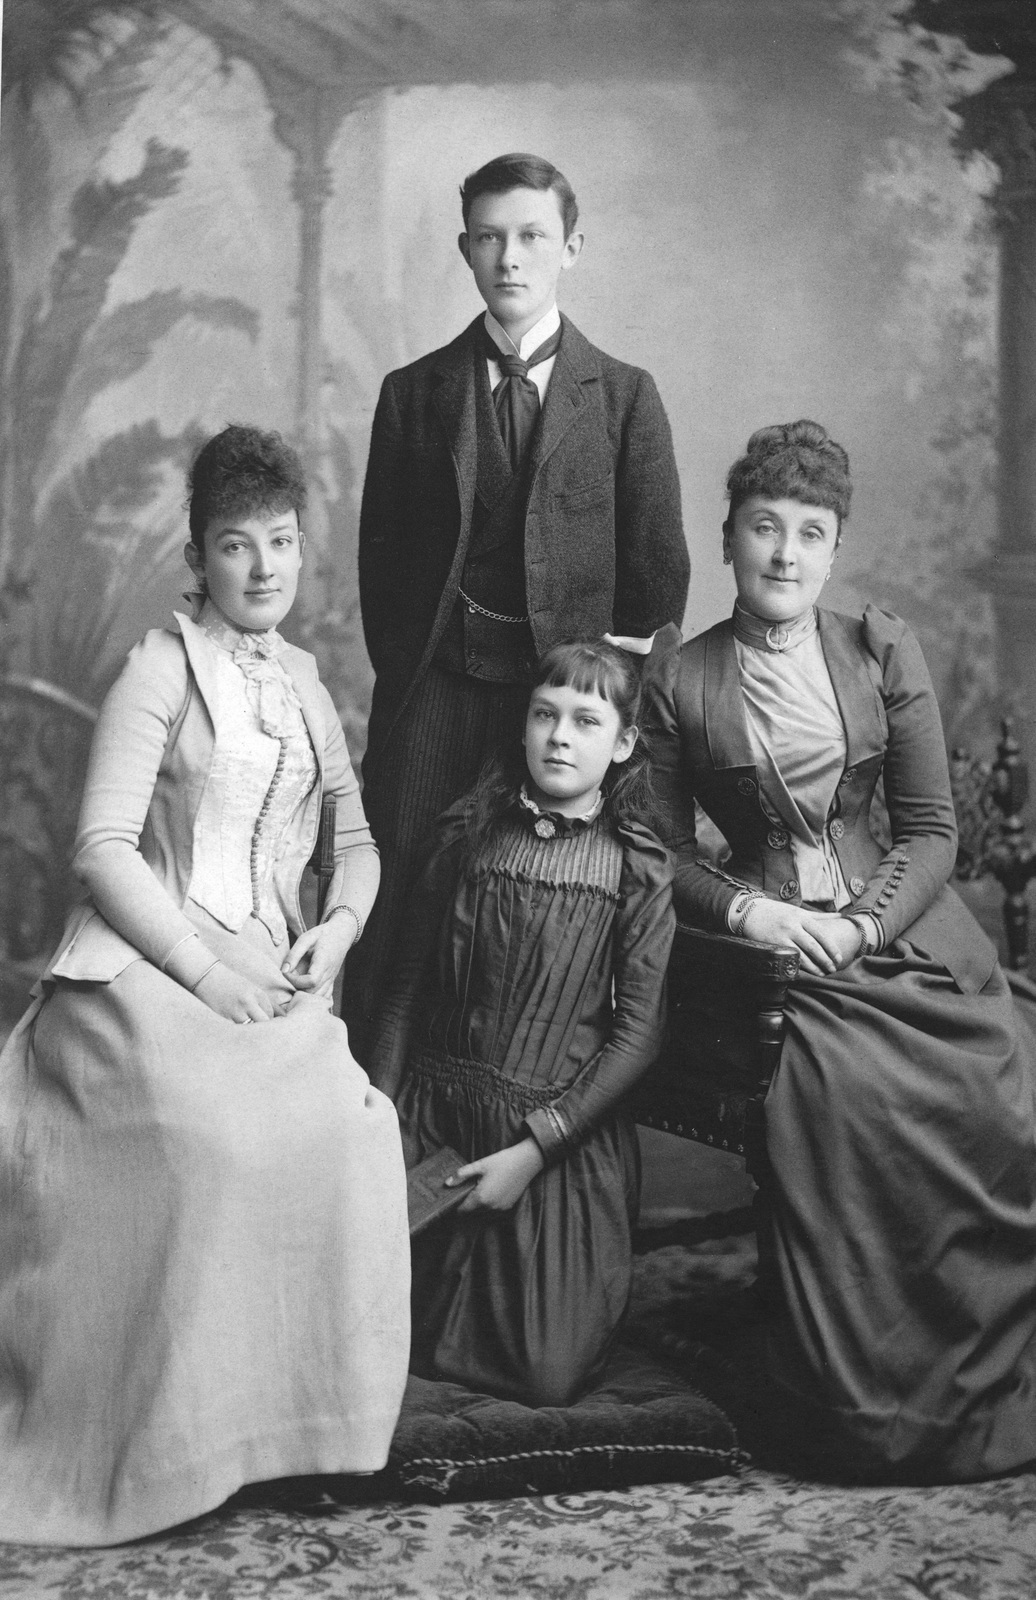 Hart Family c. 1888